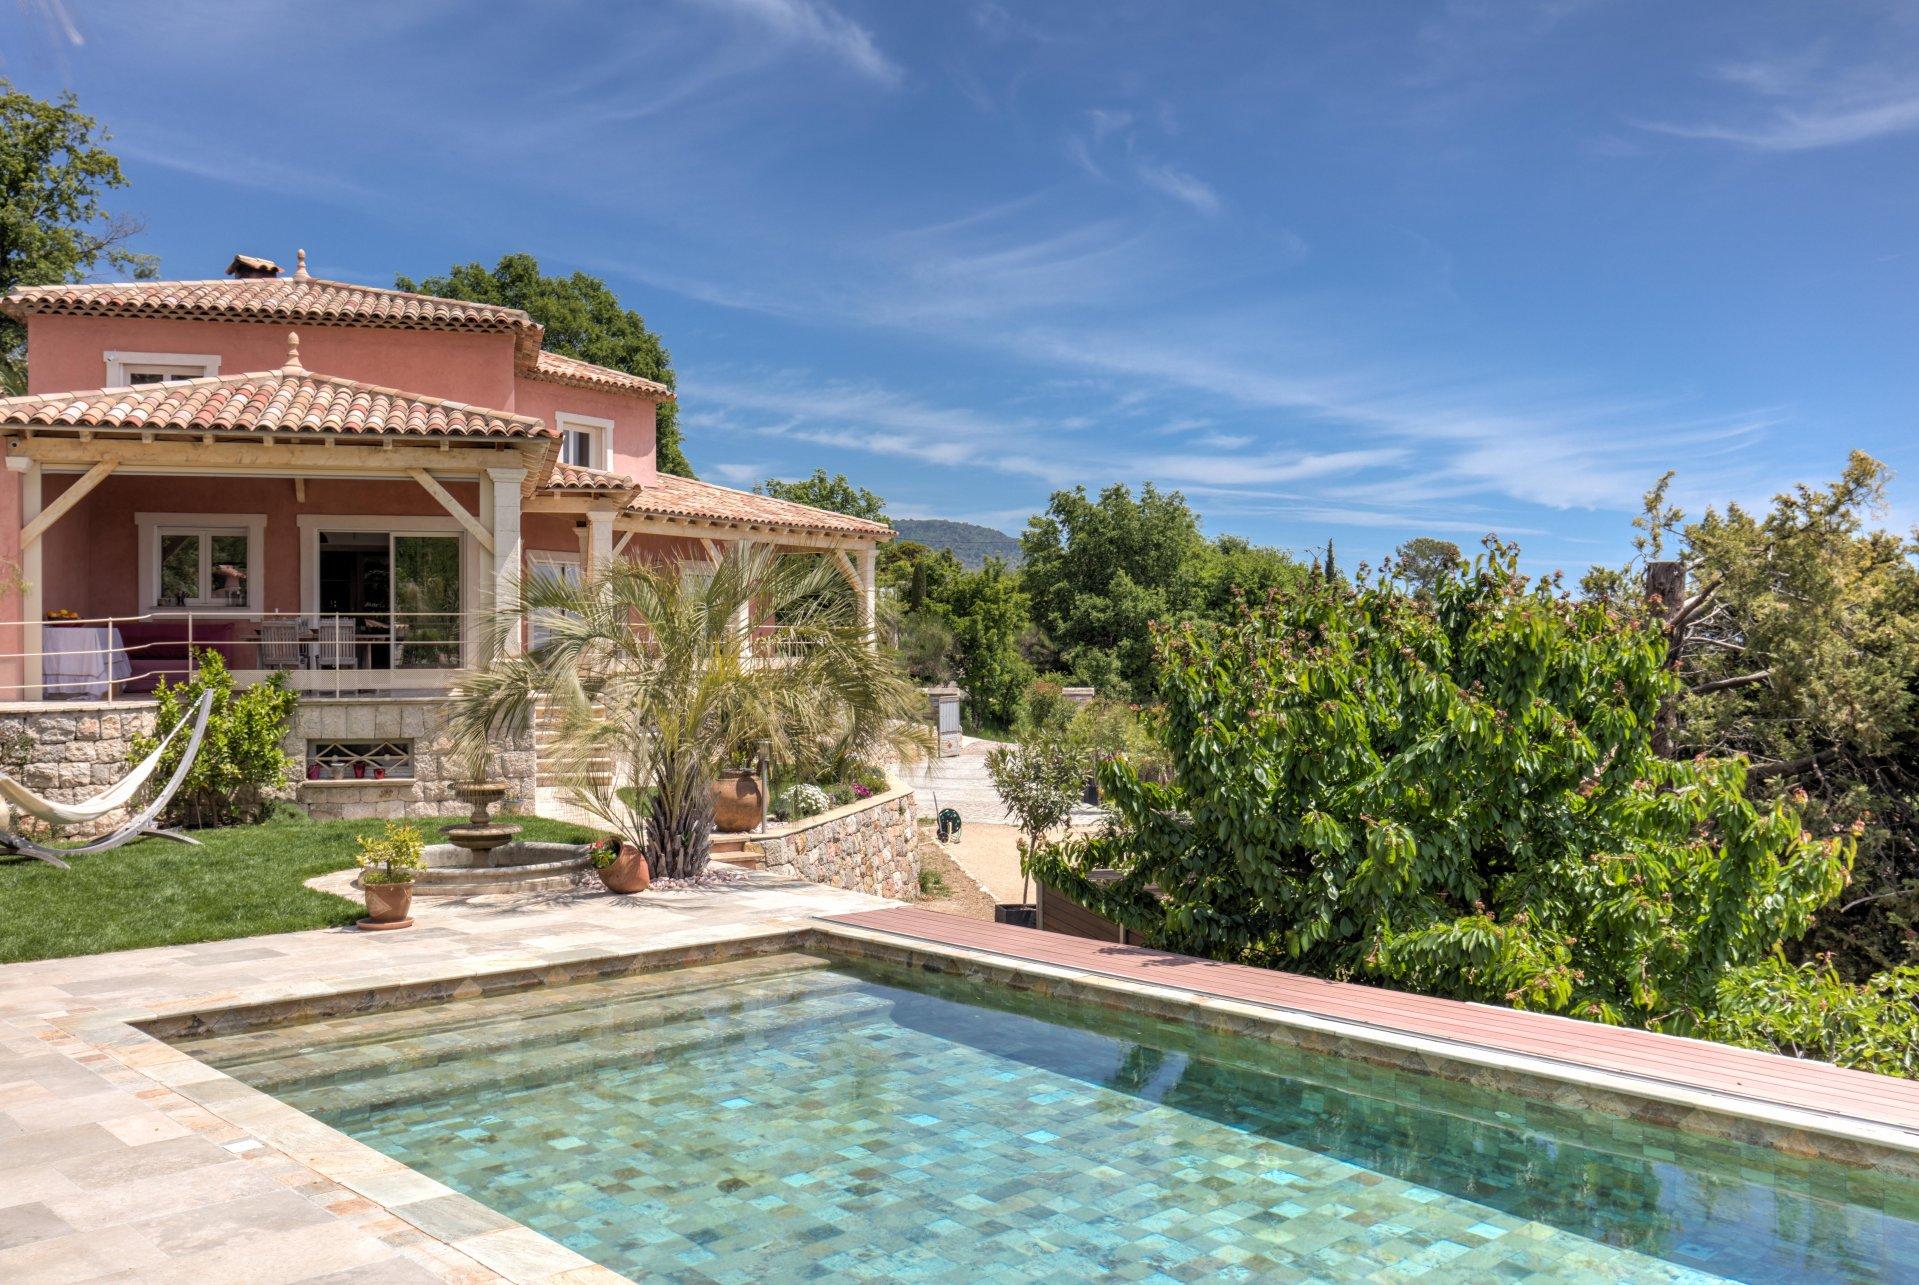 CABRIS : Recently built high-quality villa with superb views